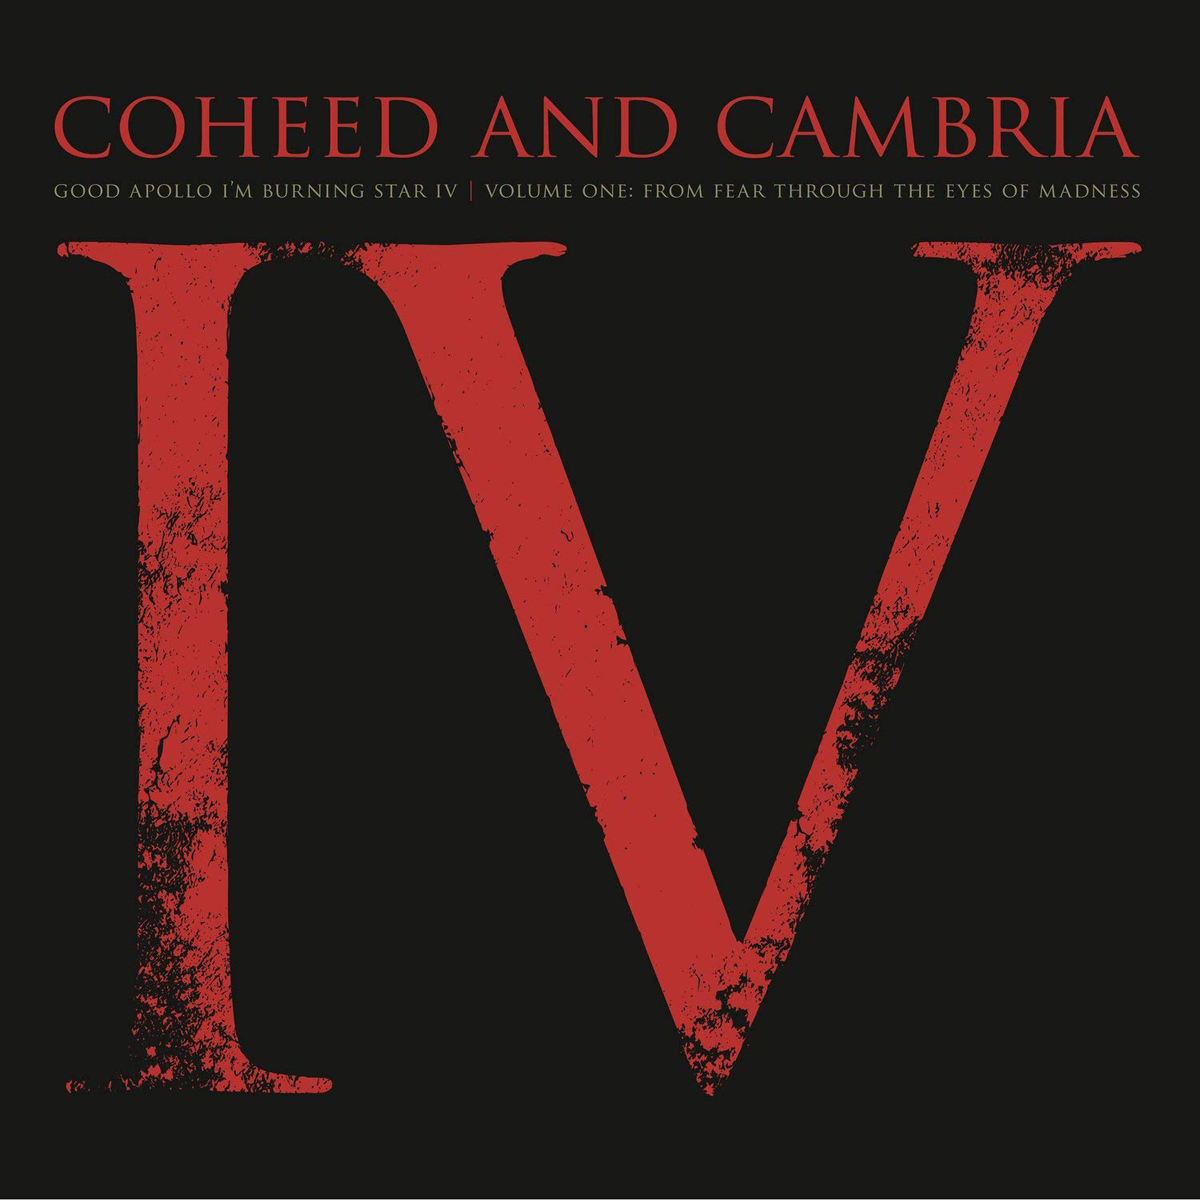 Coheed And Cambria Coheed And Cambria. Good Apollo I'm Burning Star IV. Vol. 1 (2 LP) coheed and cambria saskatoon